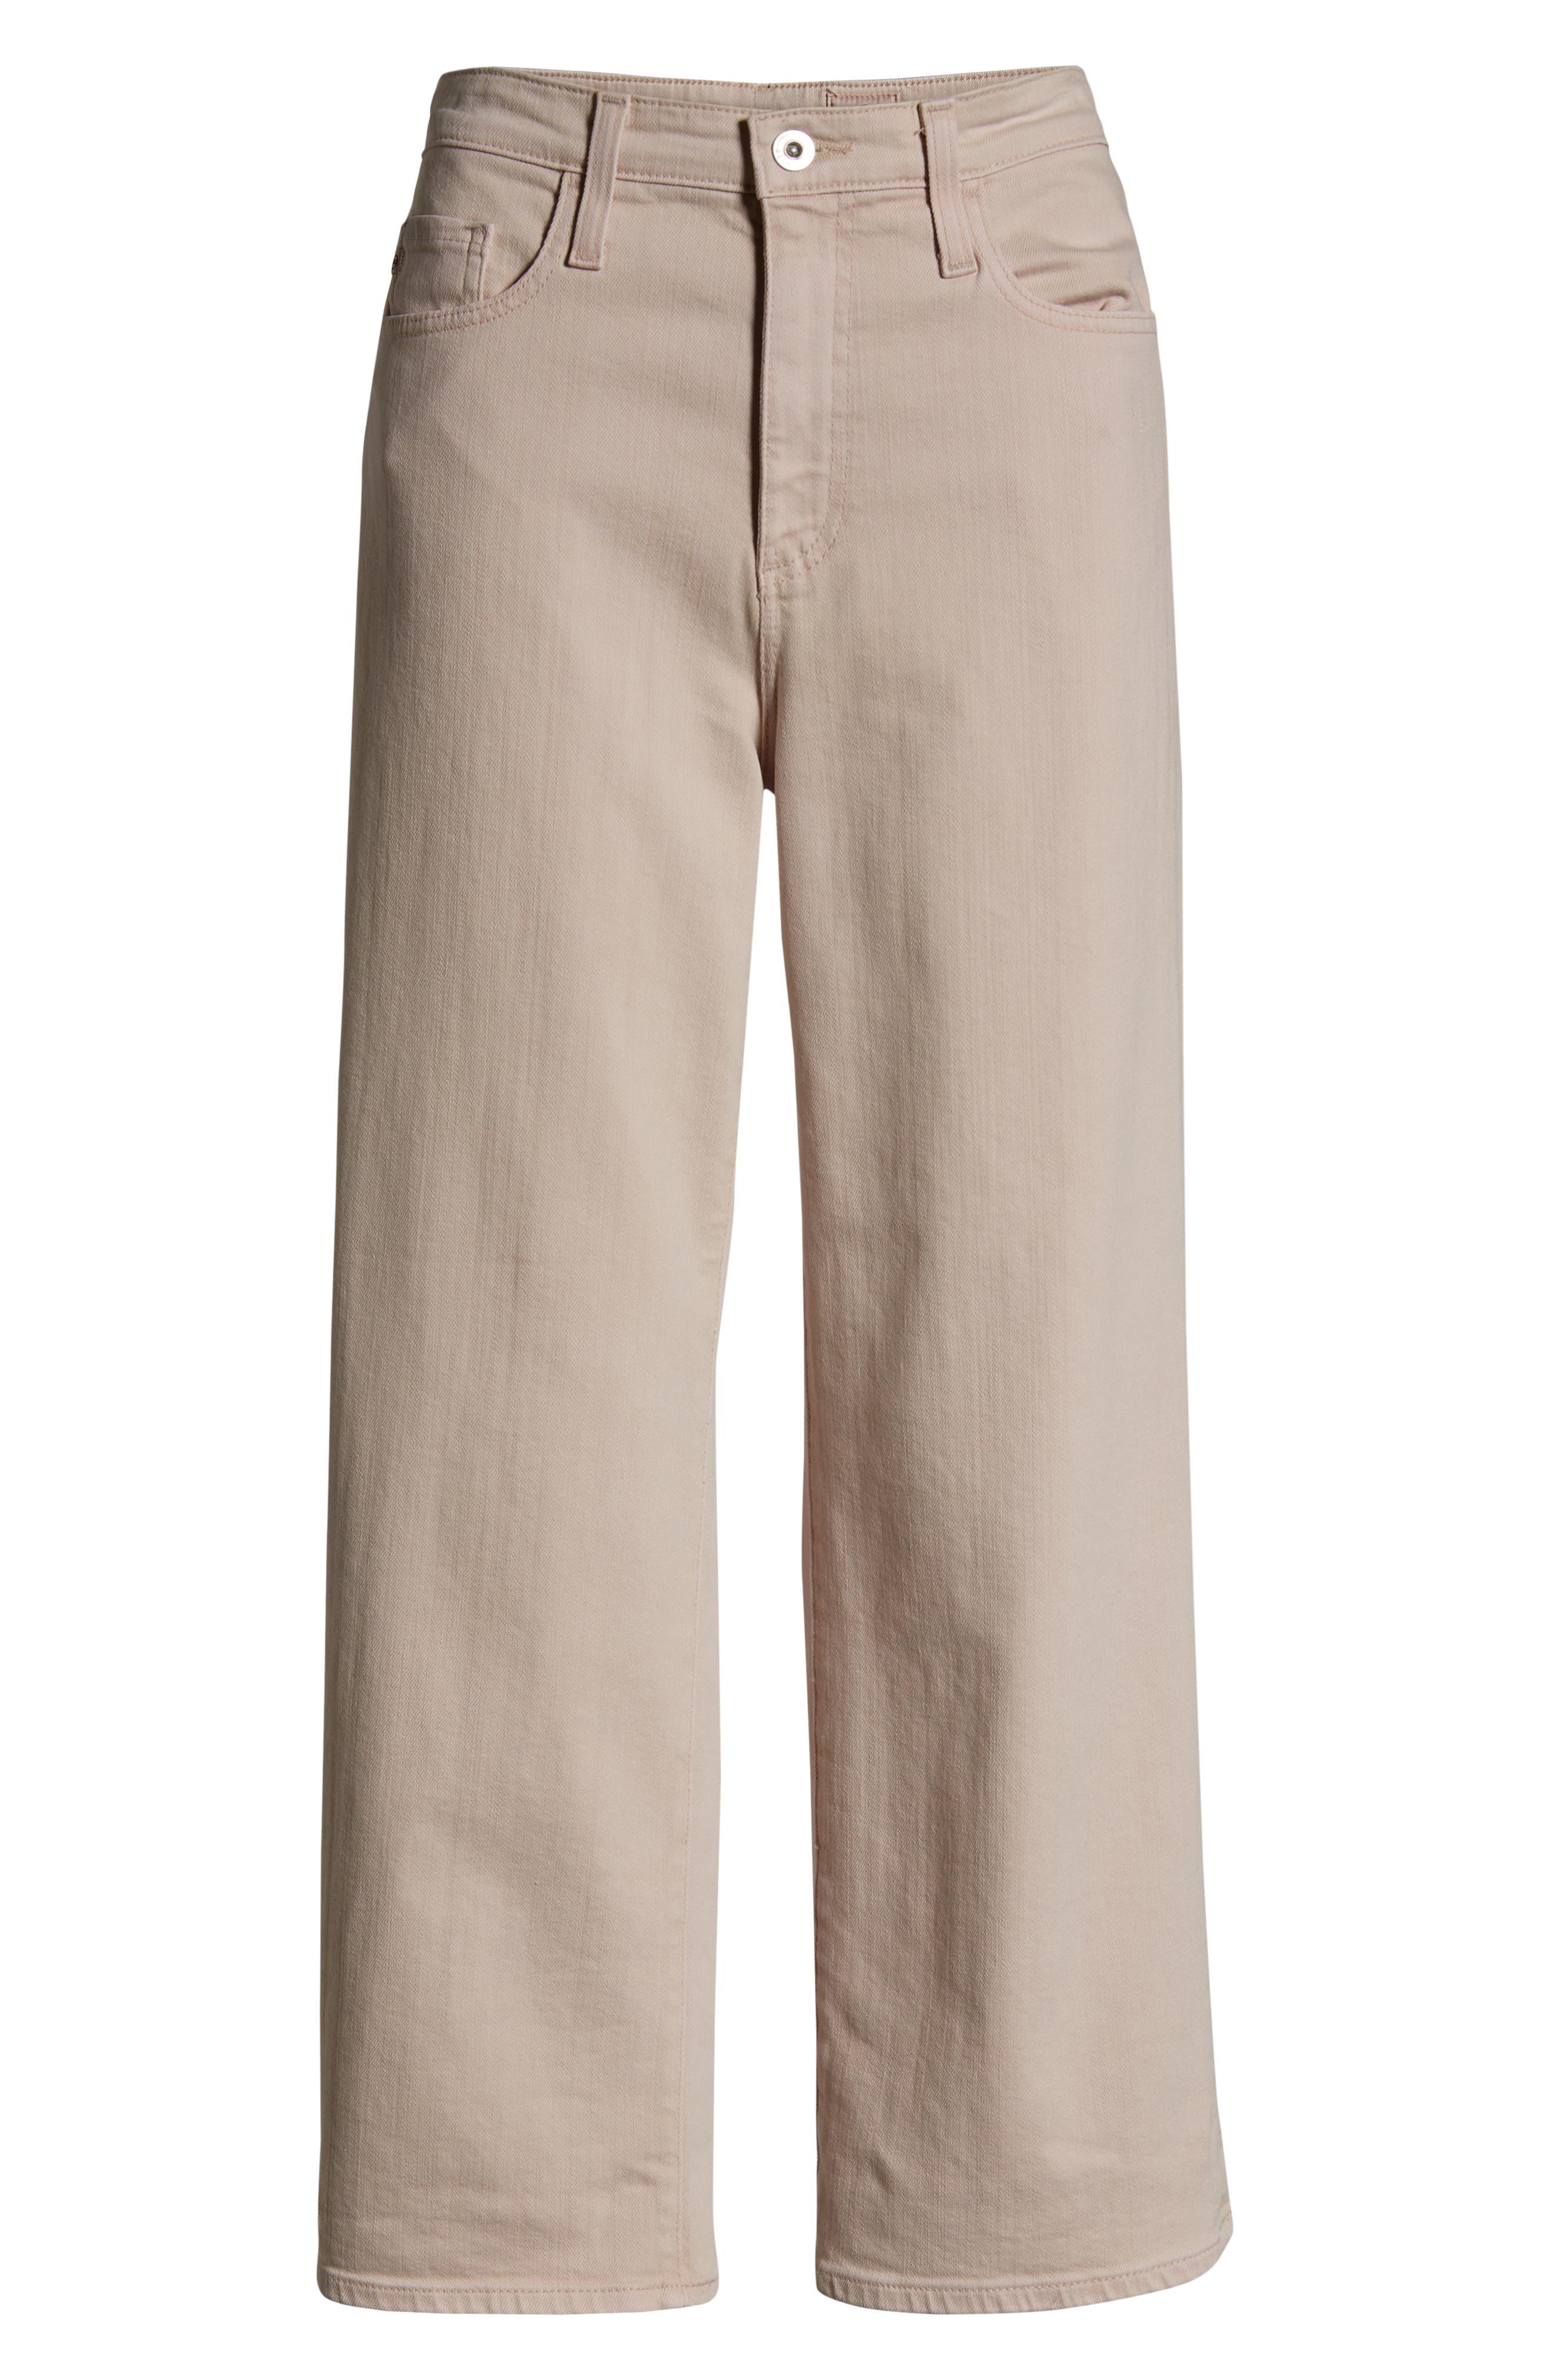 AG, Etta High Waist Crop Wide Leg Jeans, Alternate thumbnail 7, color, SULFUR PEAKED PINK